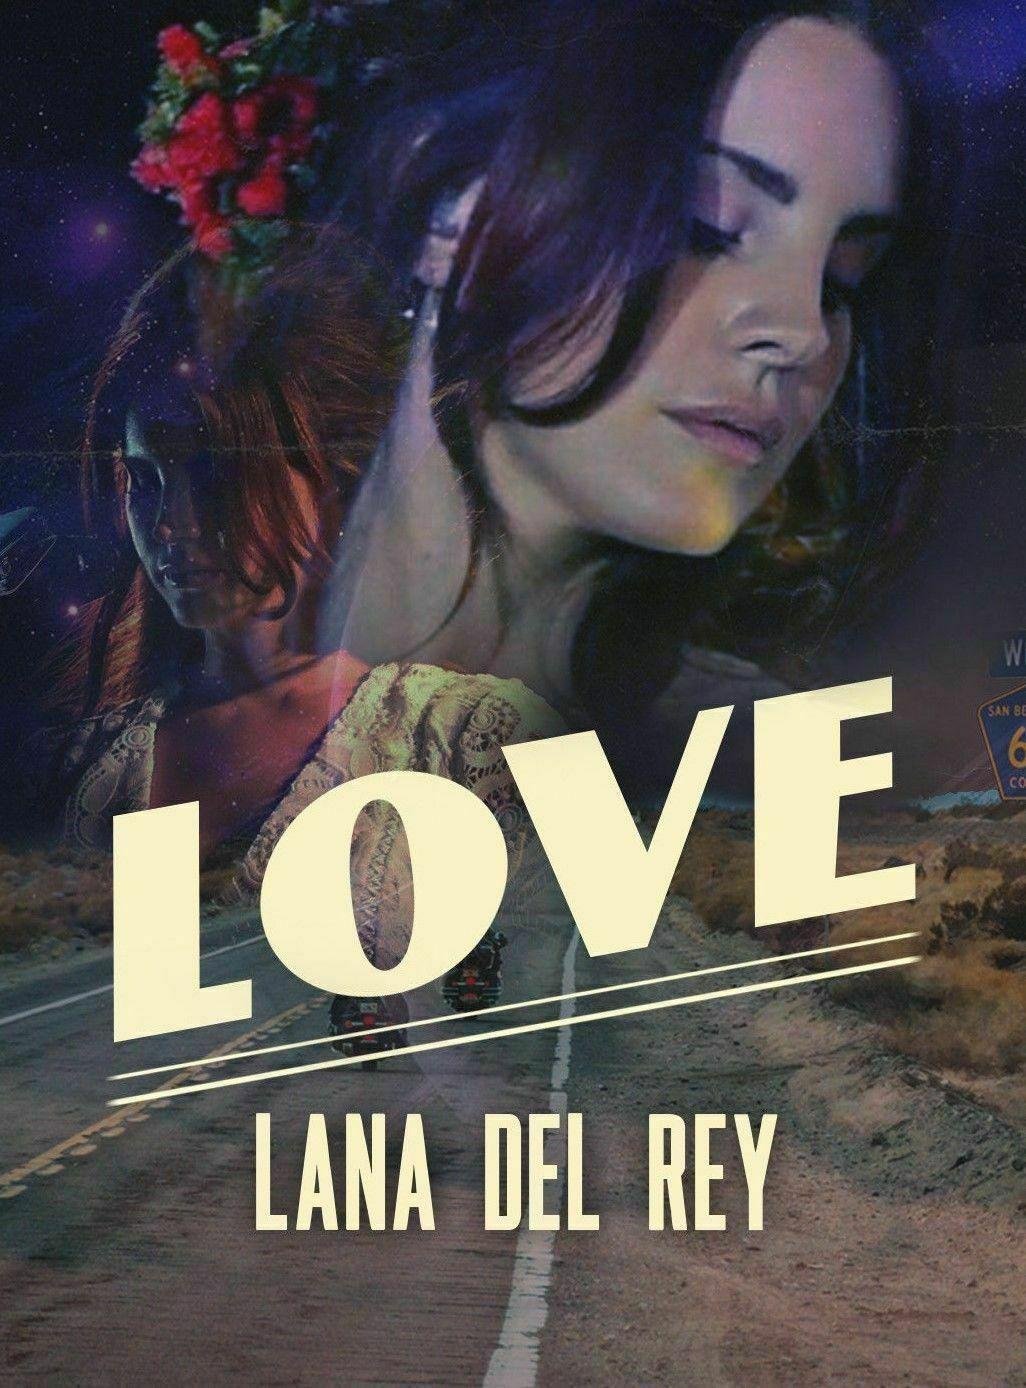 2020 Lana Del Rey Art Silk Print Poster 24x36inch60x90cm 016 From Chuy8988 10 38 Dhgate Com